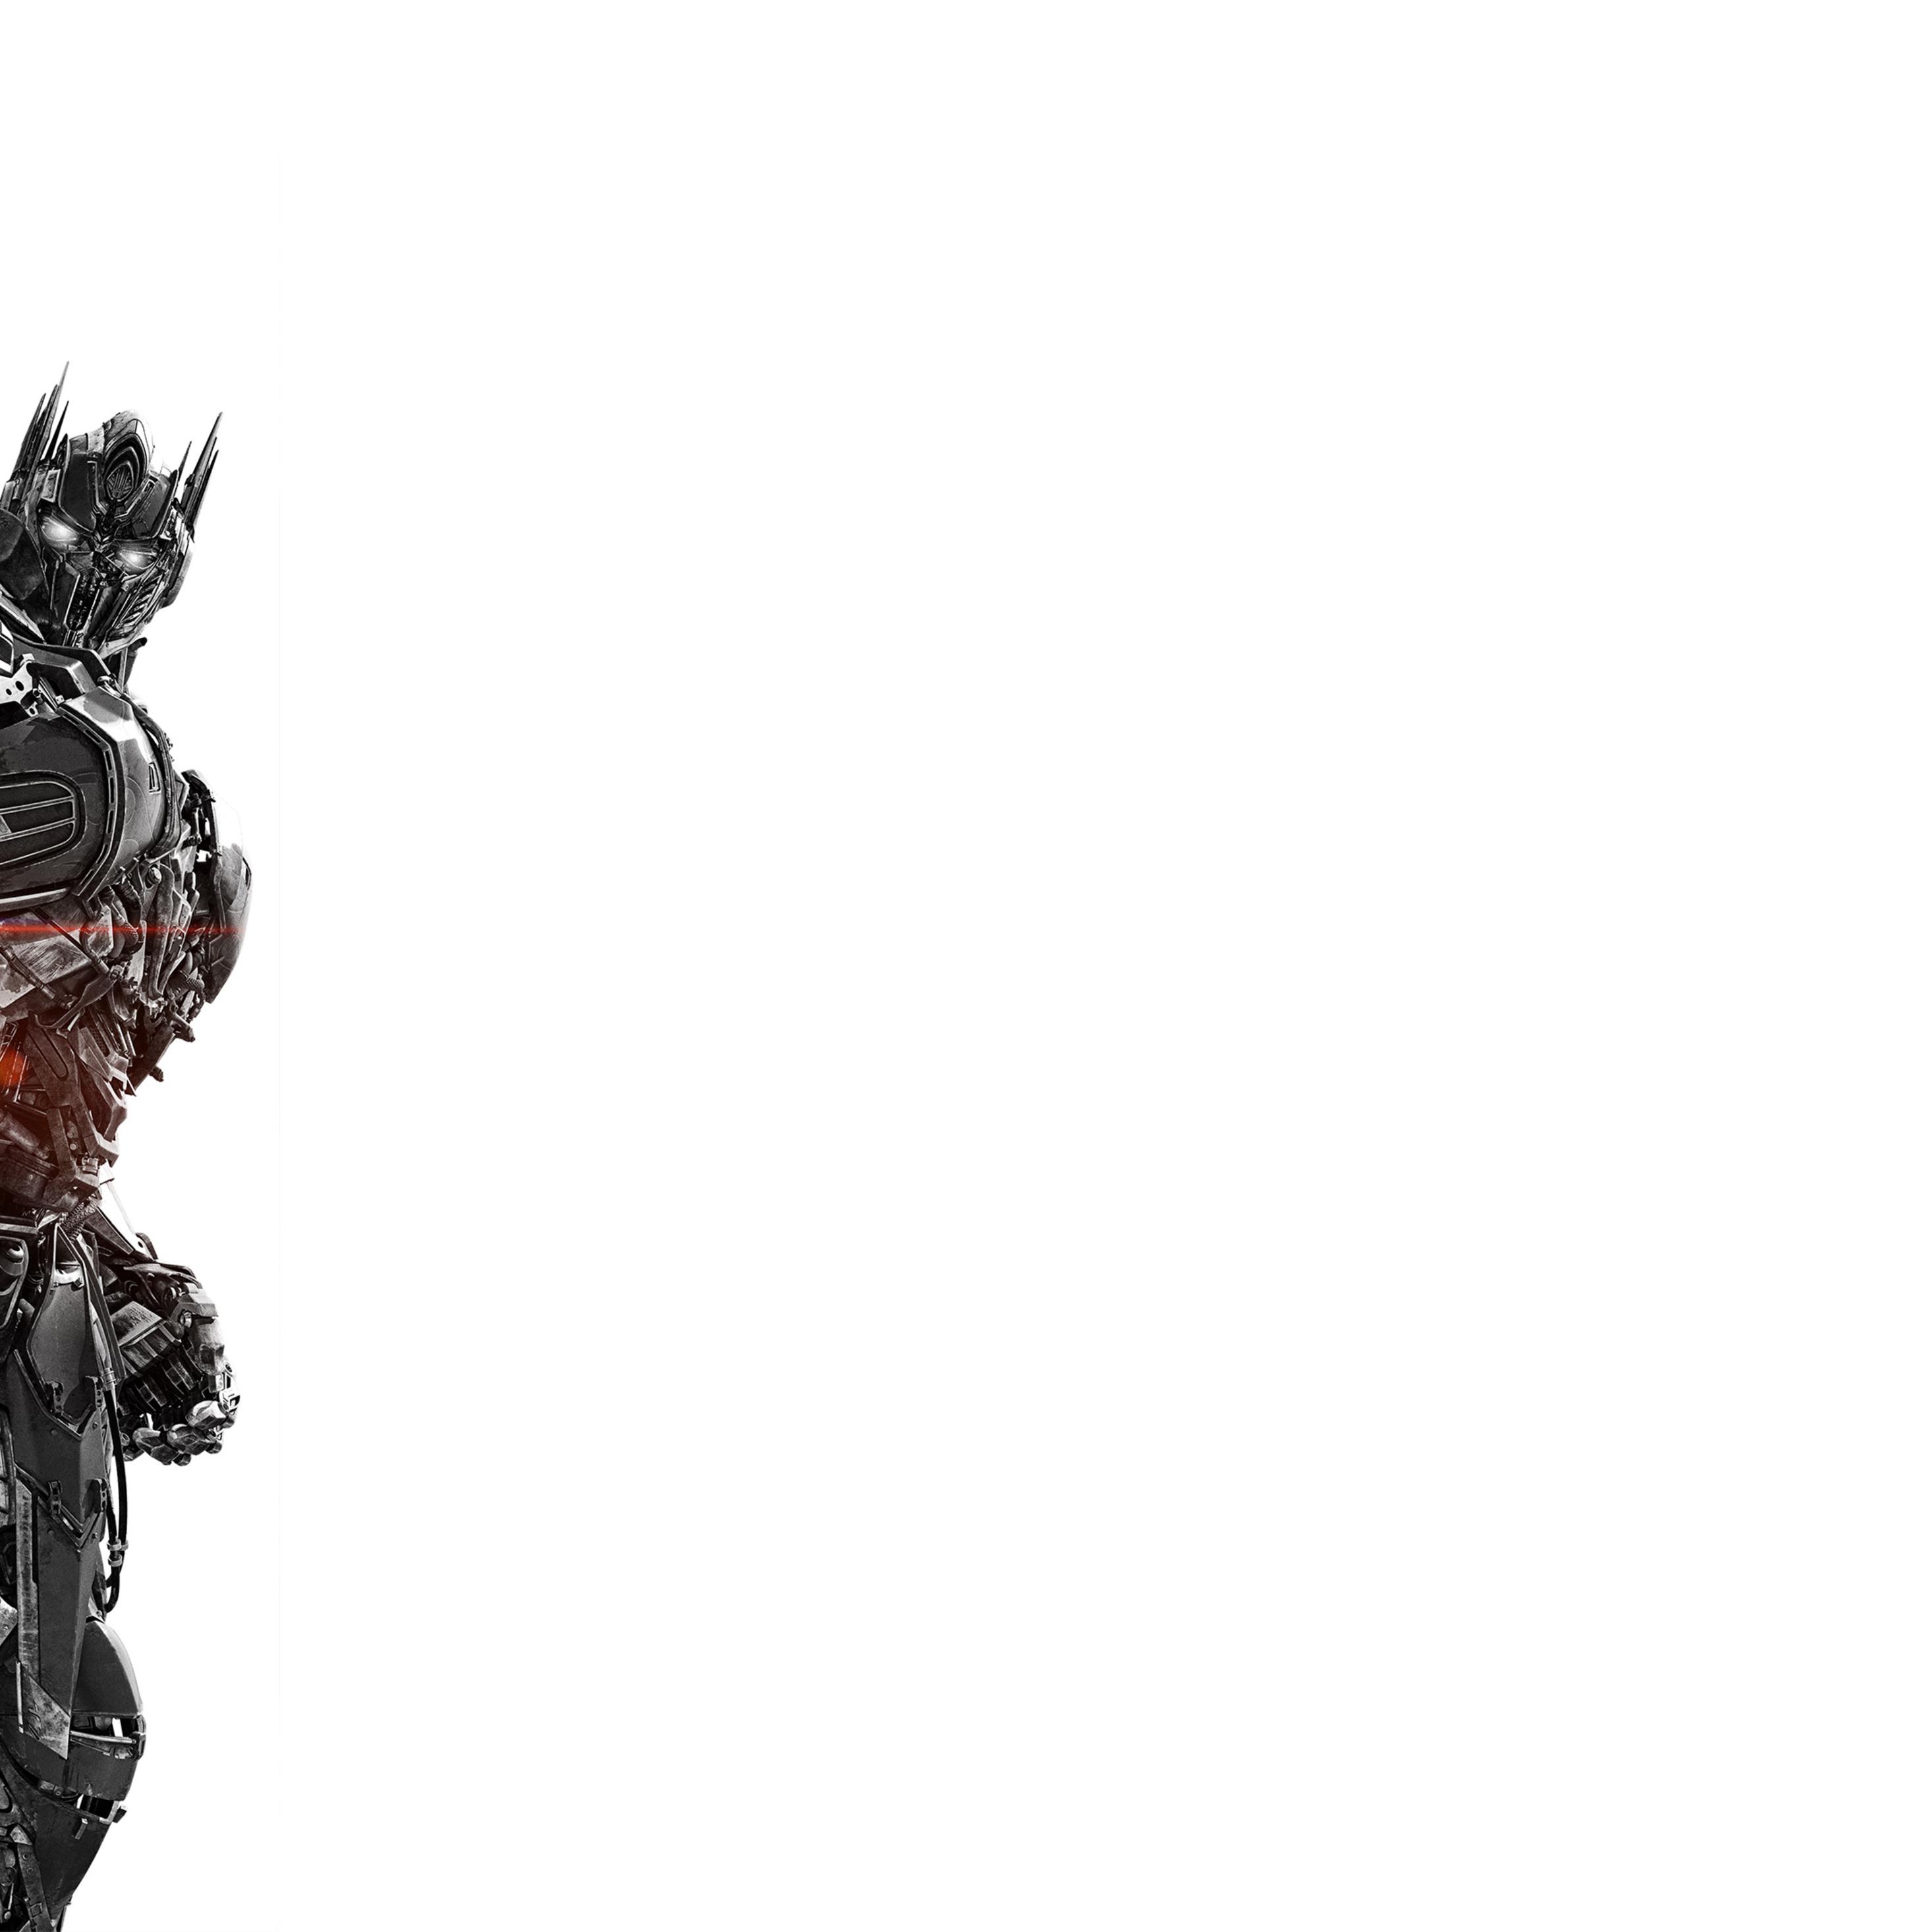 Optimus Prime Wallpaper Hd: 2932x2932 Transformers The Last Knight Optimus Prime Ipad